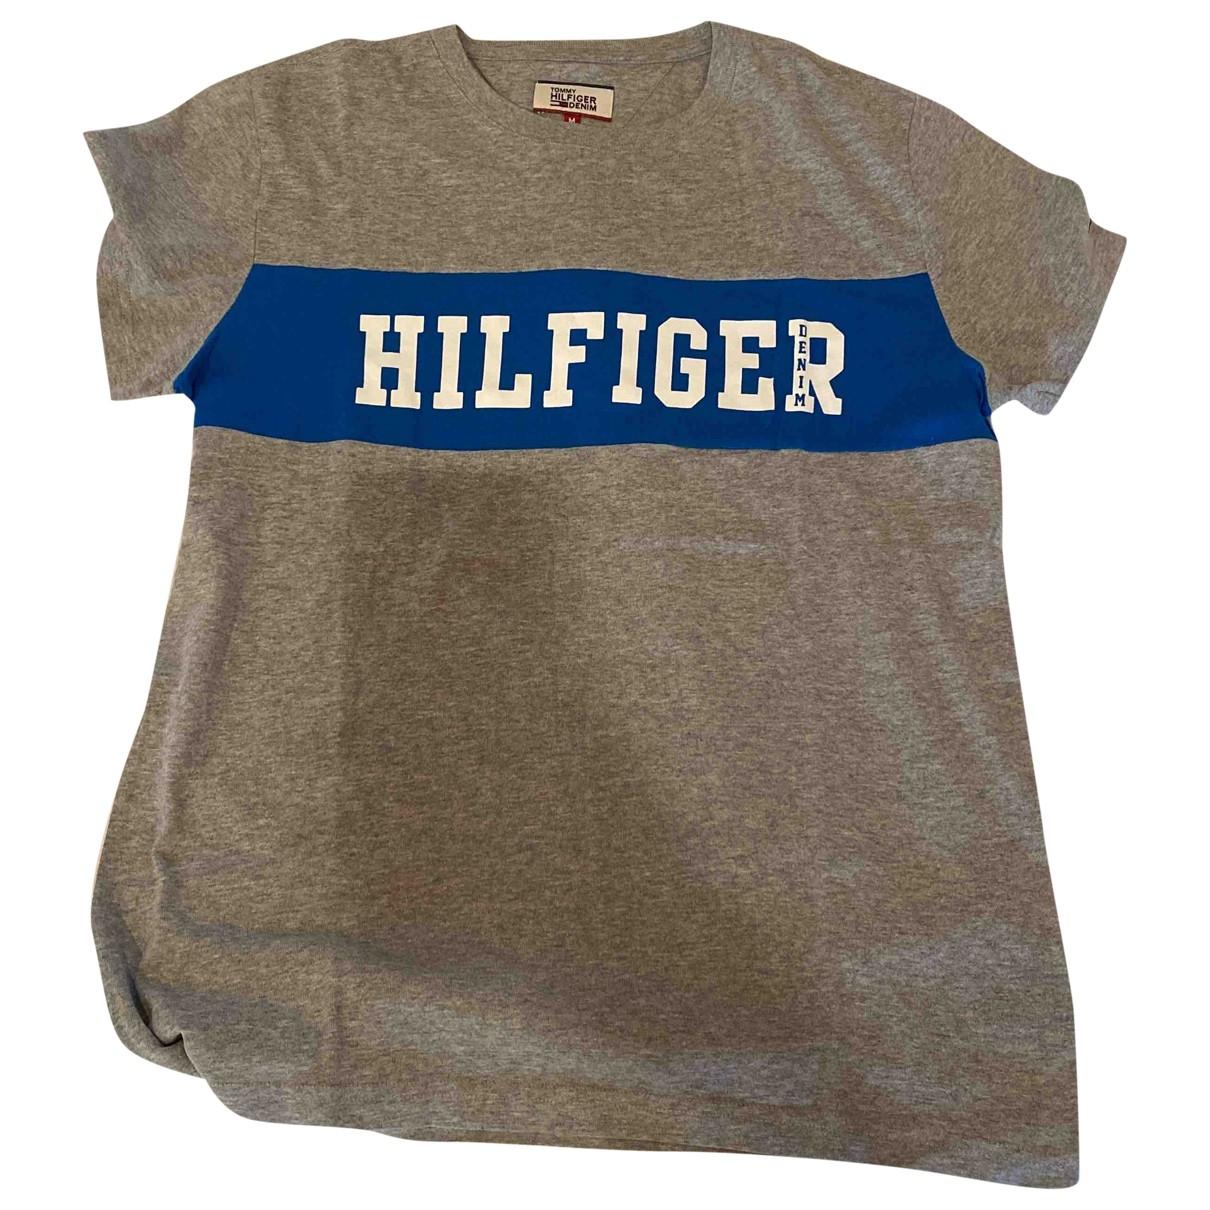 Tommy Hilfiger \N Grey Cotton T-shirts for Men M International